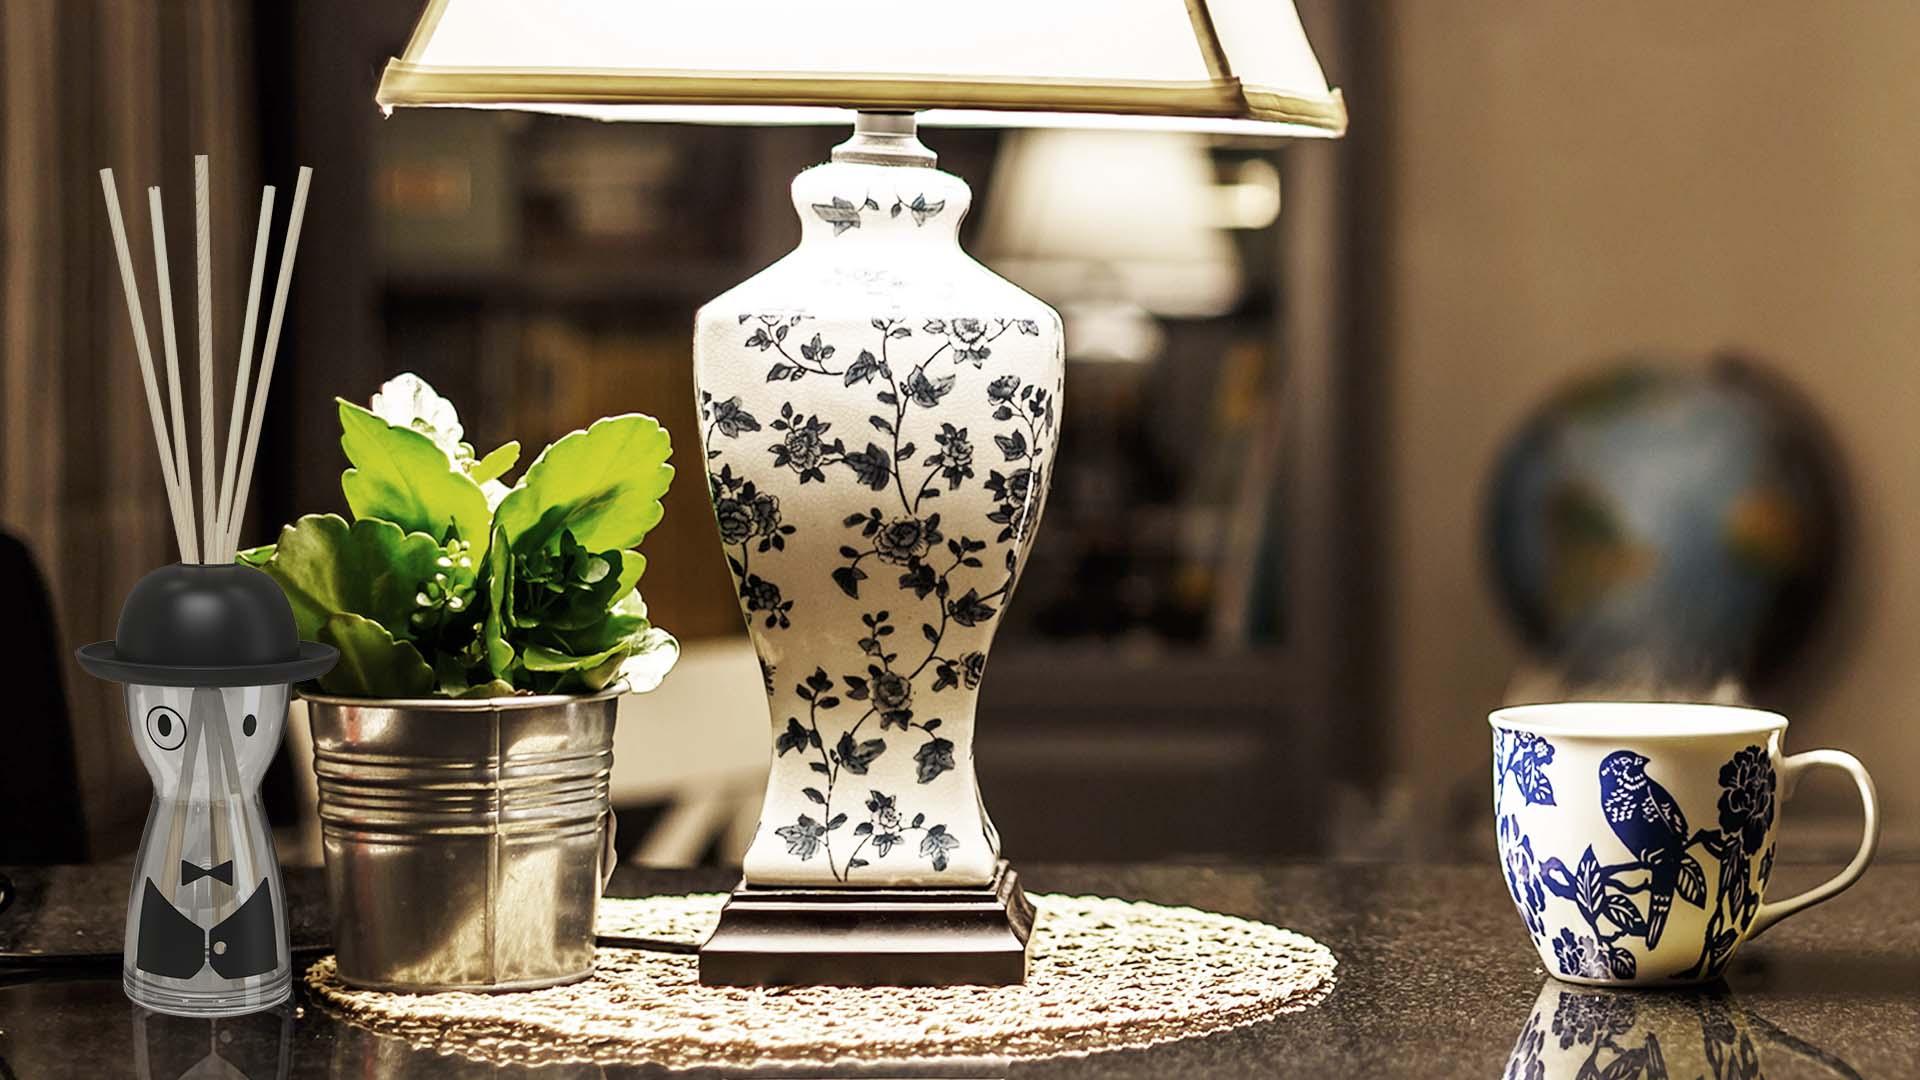 Immagine Art of Fragrances: Profumatori dal design ricercato